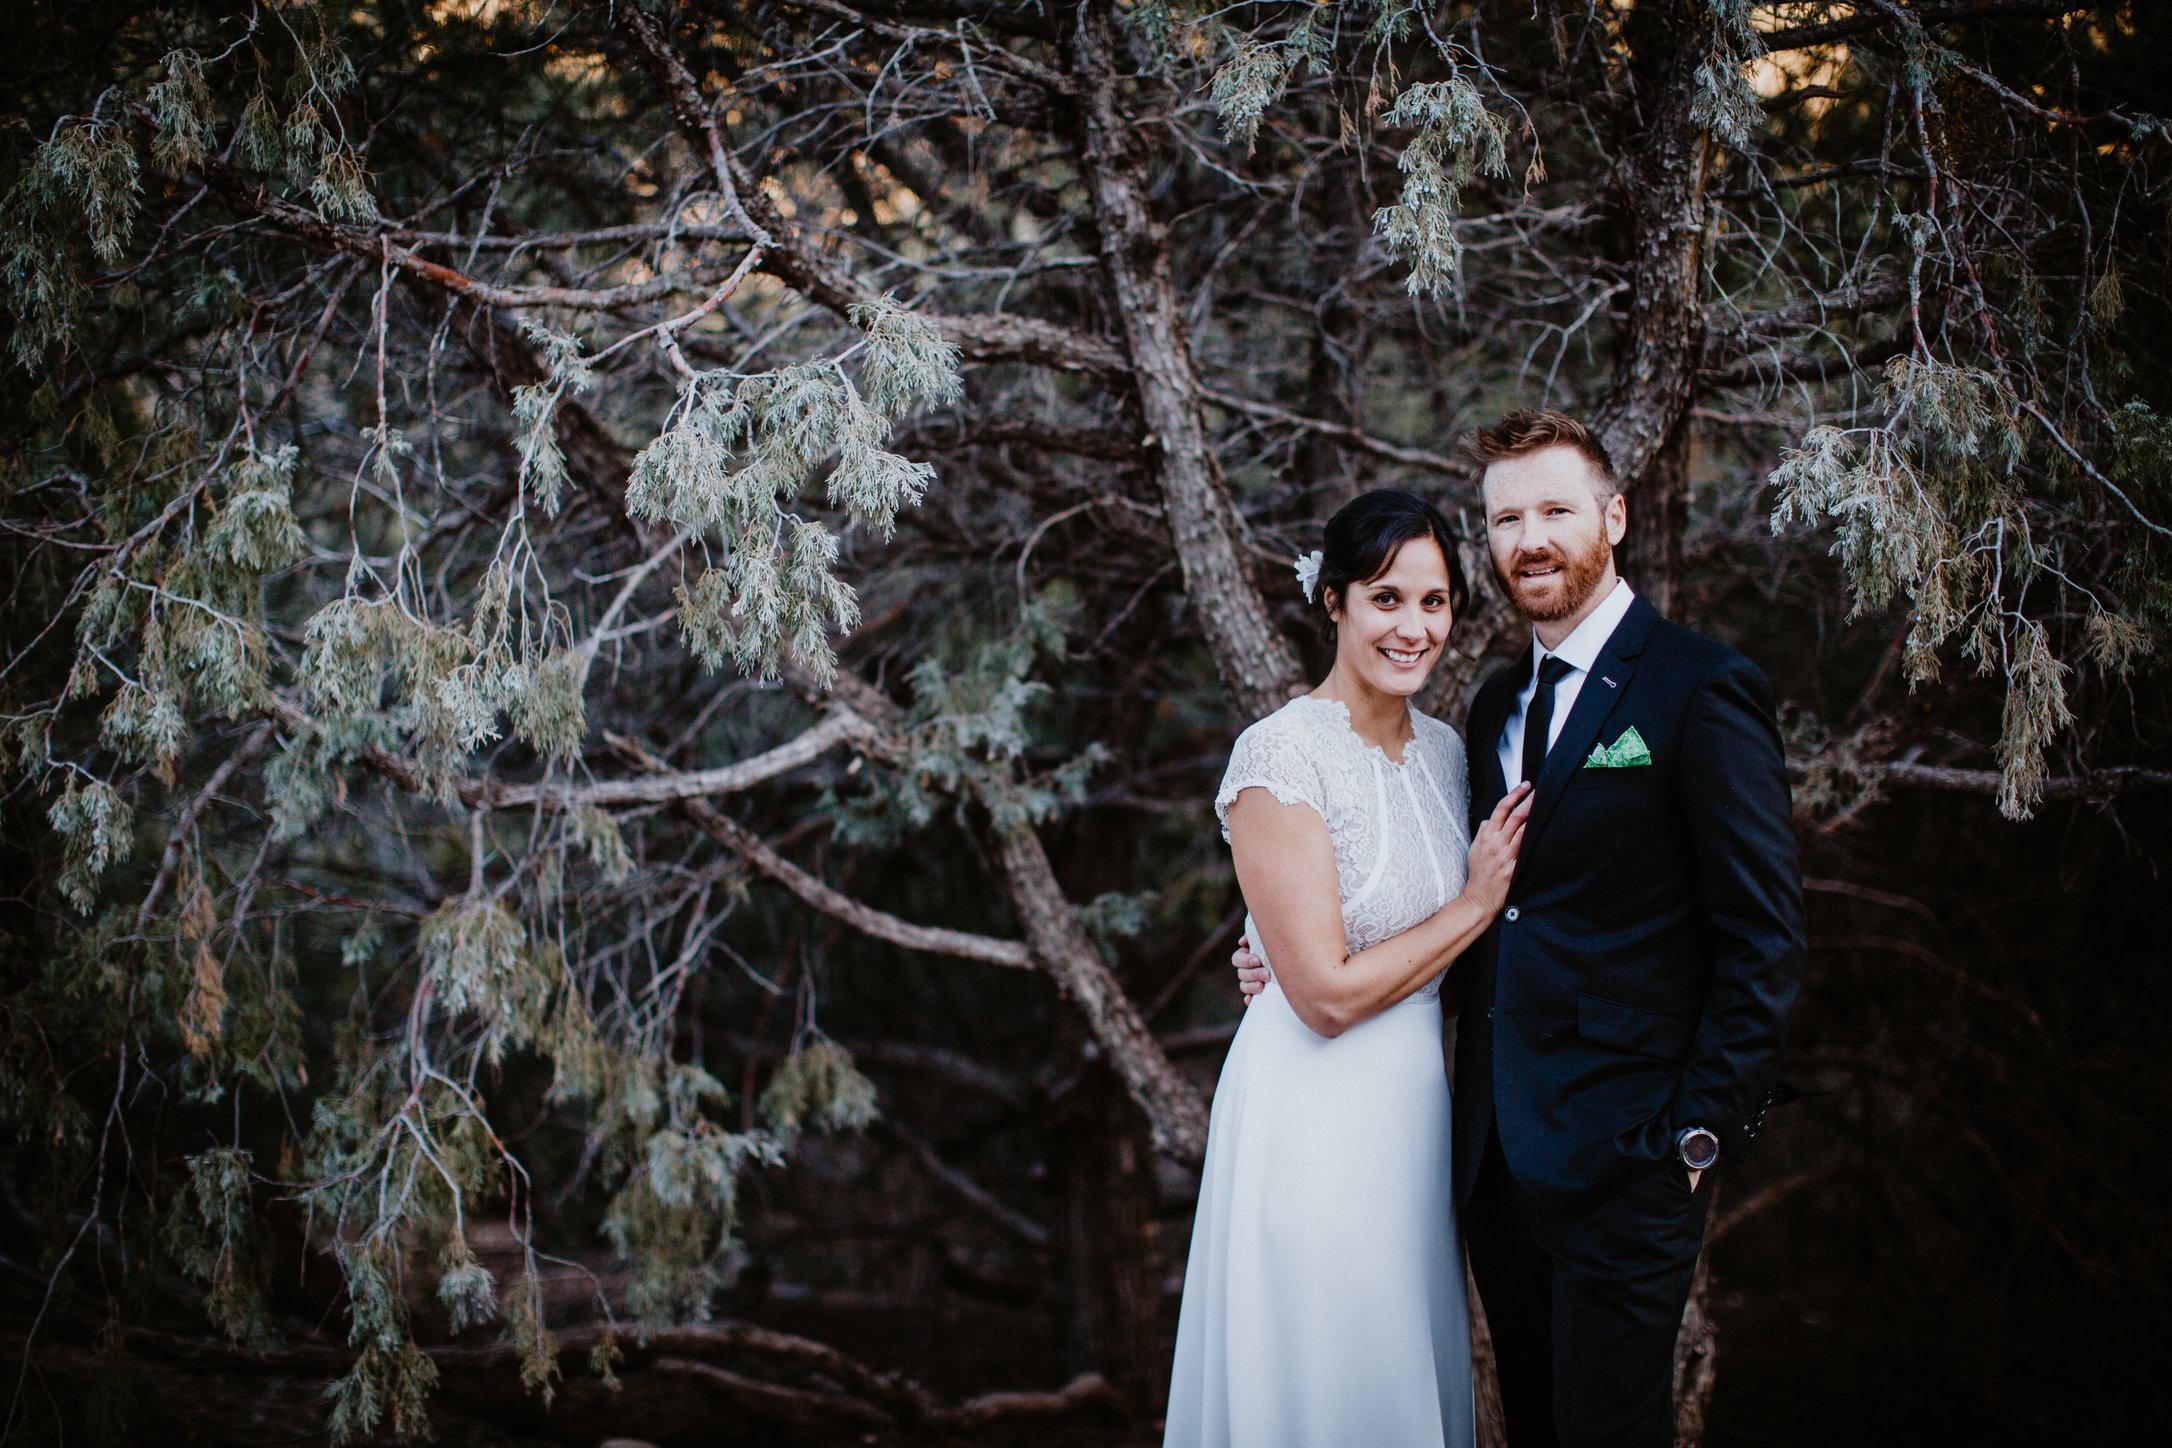 HandM-wedding-187.jpg